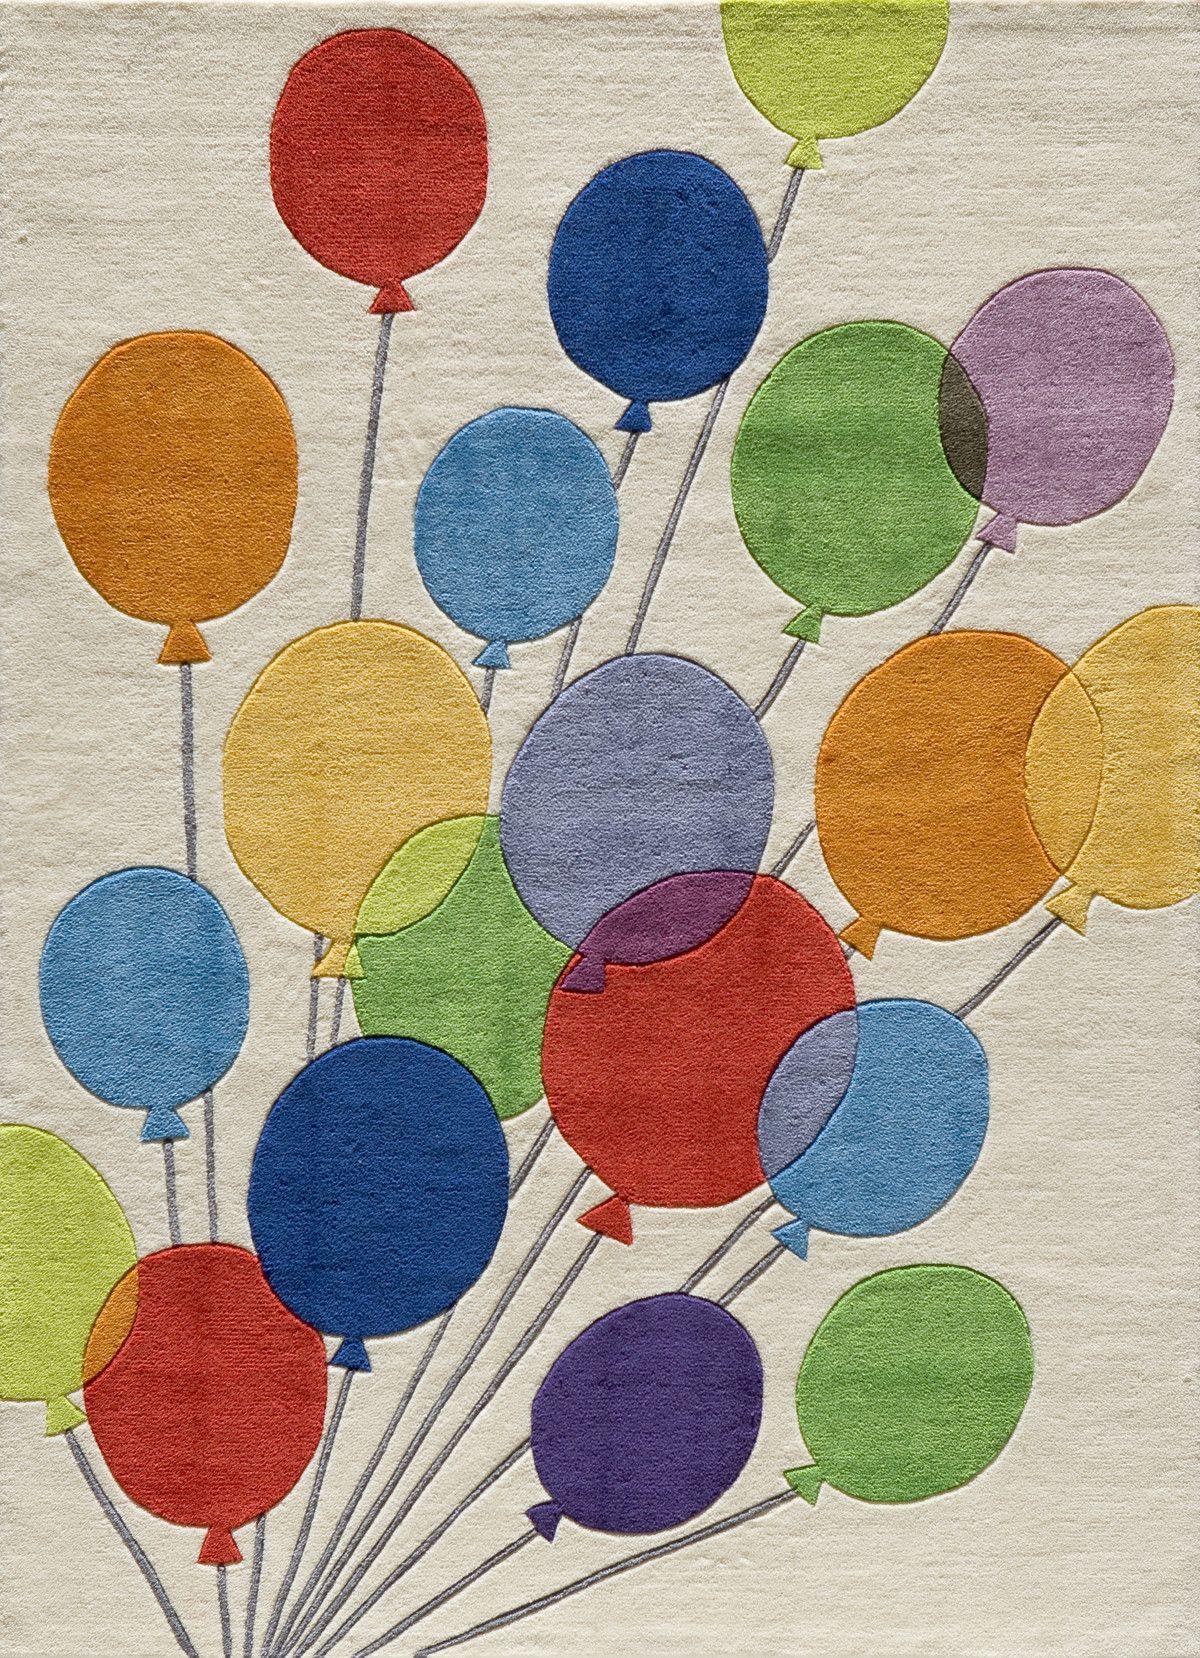 Momeni Lil Mo Whimsy Balloon Kids Rug